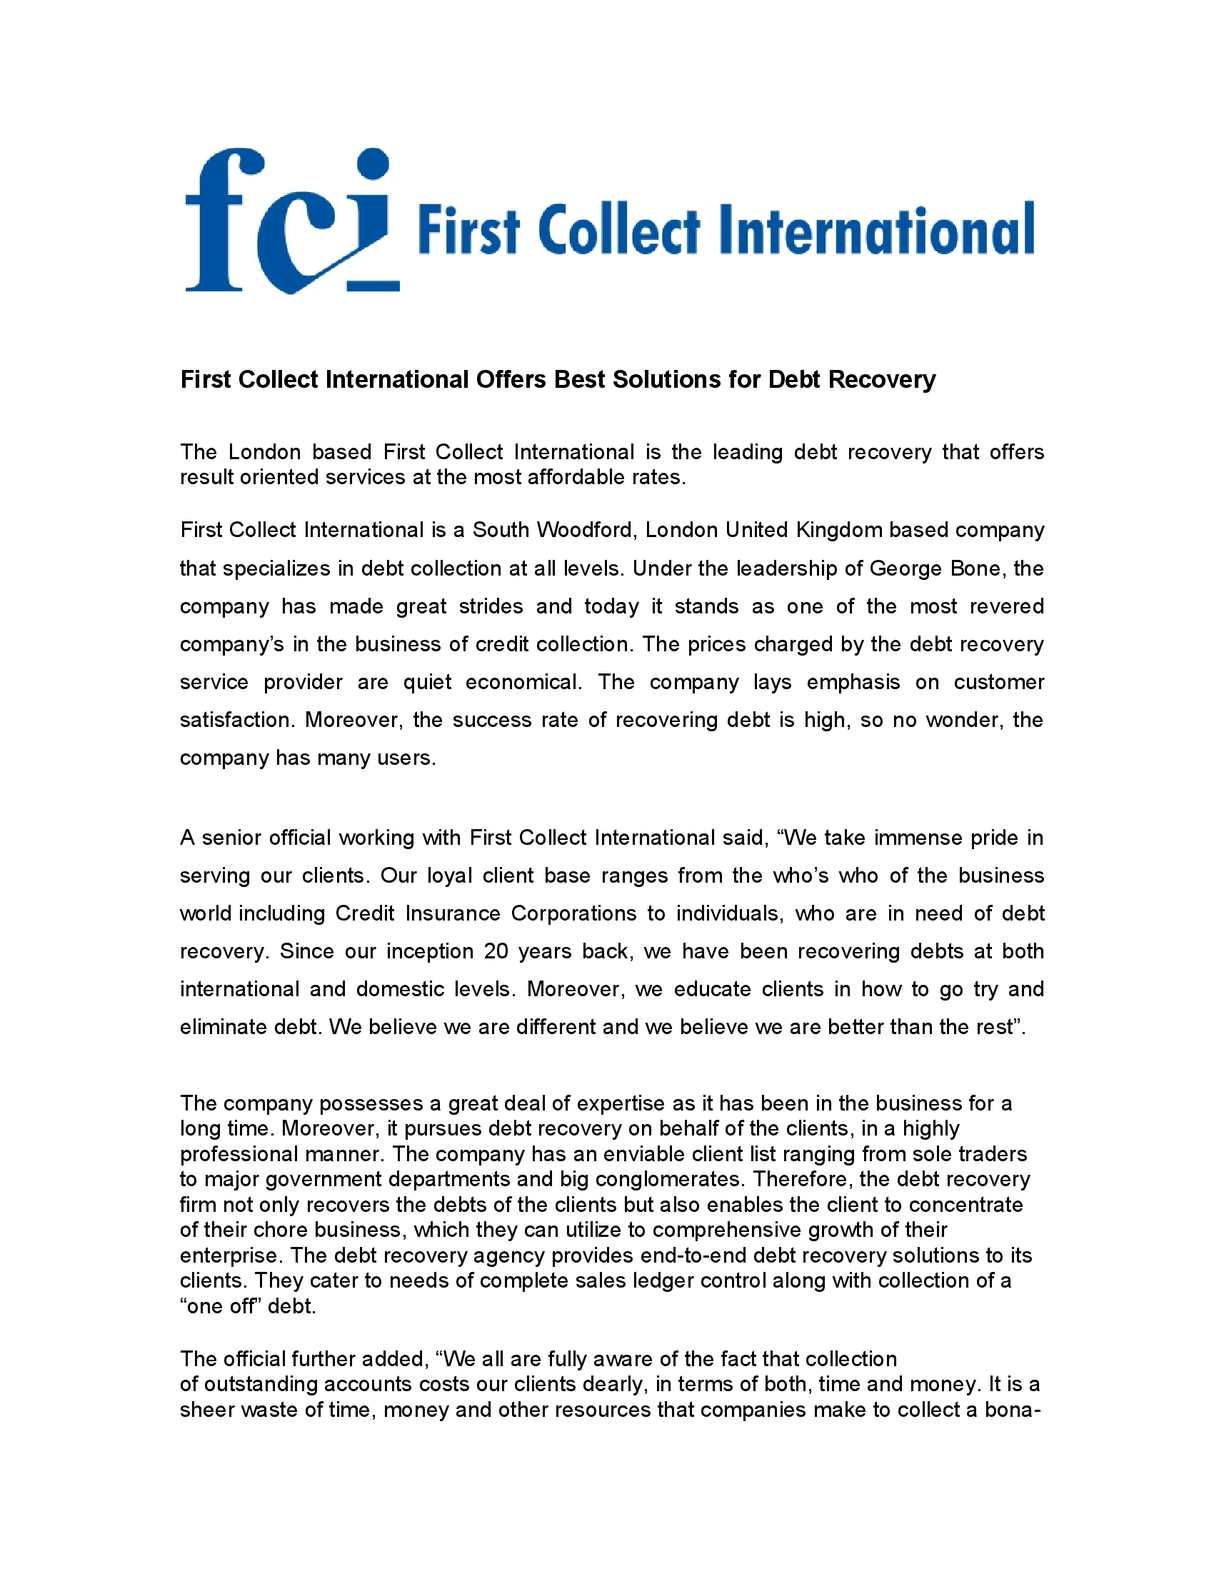 Calaméo - First Collect International Offers Best Solutions